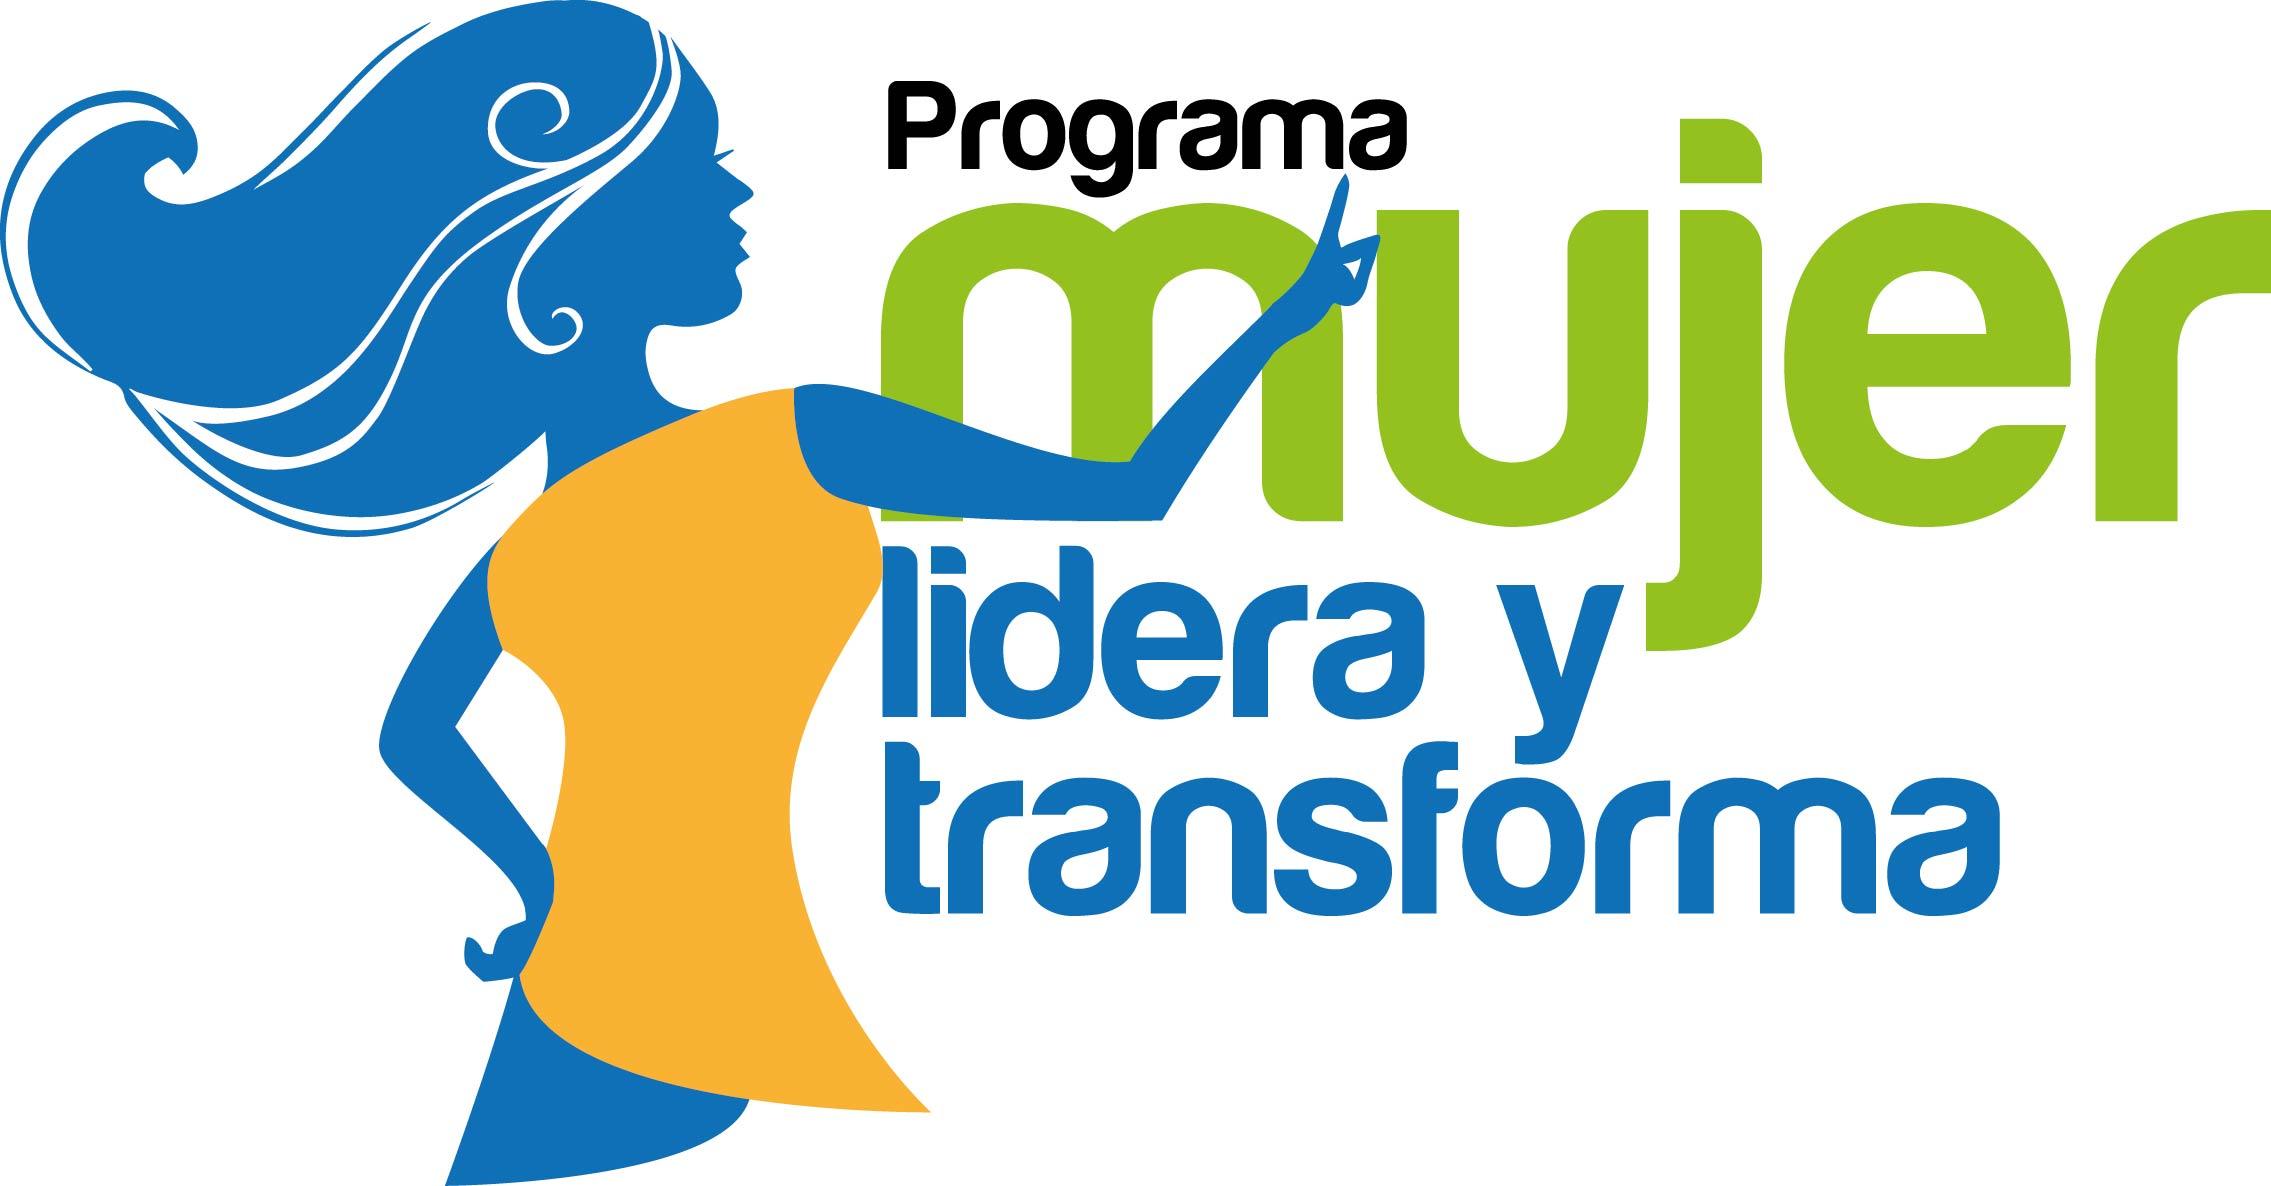 http://www.miraflores.gob.pe/Gestorw3b/files/img/9522-21010-logo-mujer-curva-1.jpg